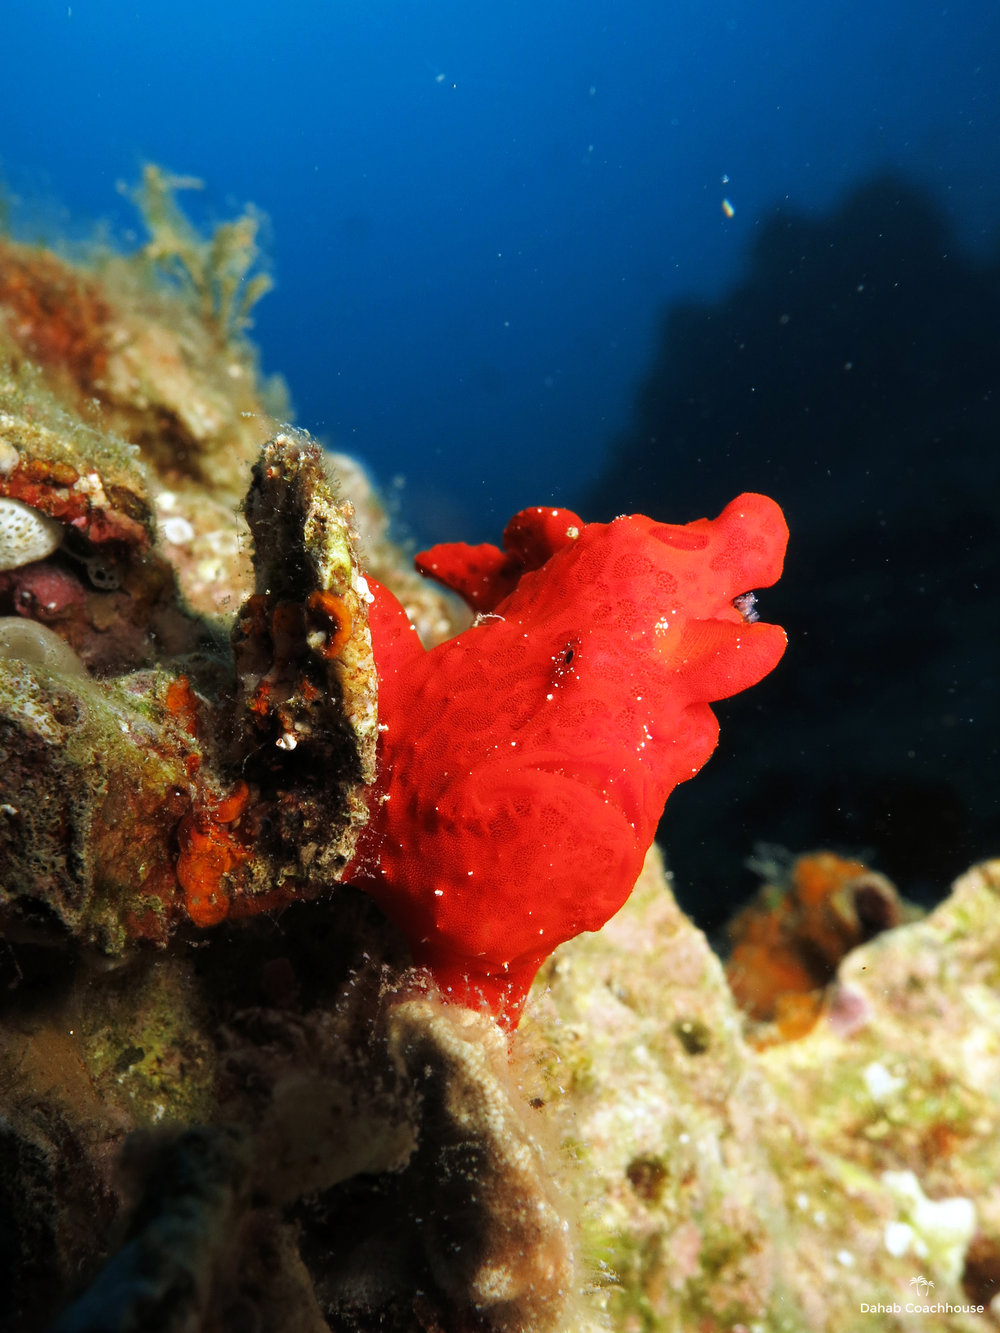 Dahab_Coachhouse_Egypt_Red_Sea_Diving_Beach_Accommodation_Holiday_Travel_Frogfish.JPG